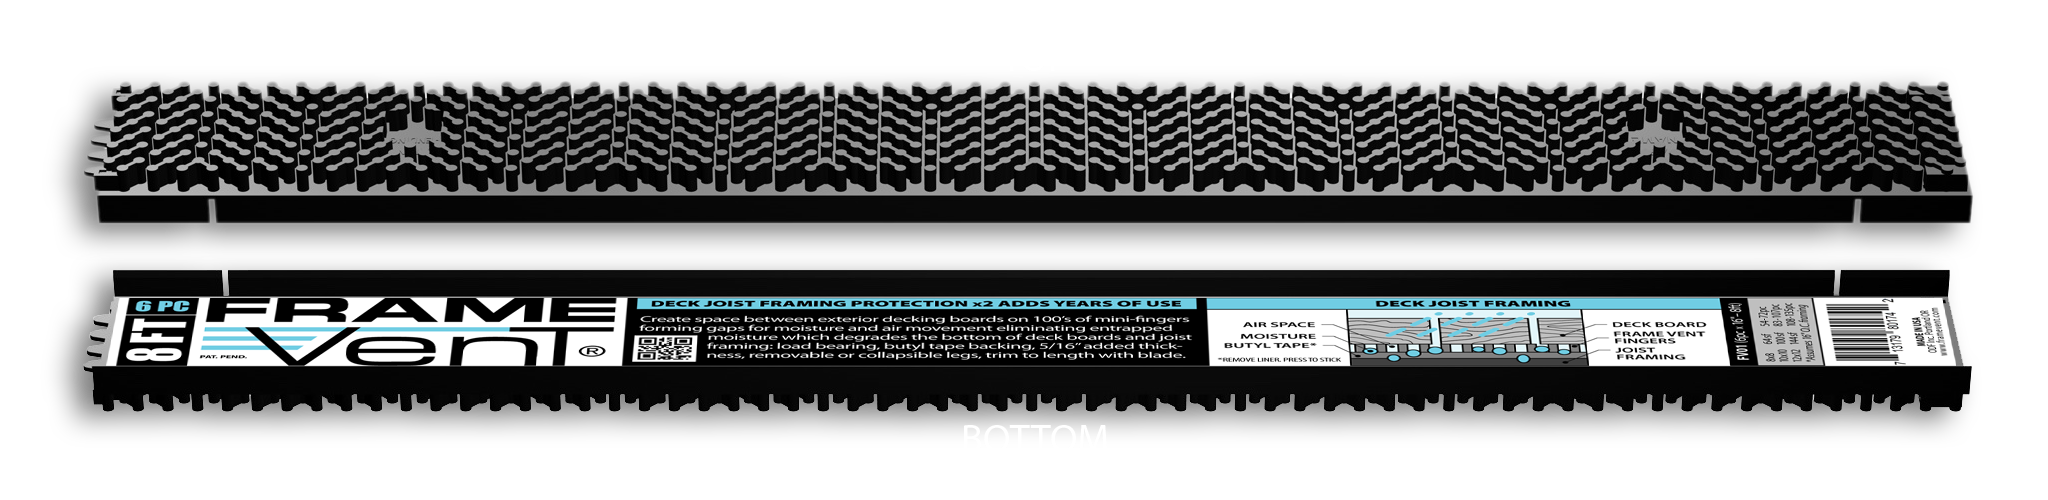 FV1 Top and Bottom